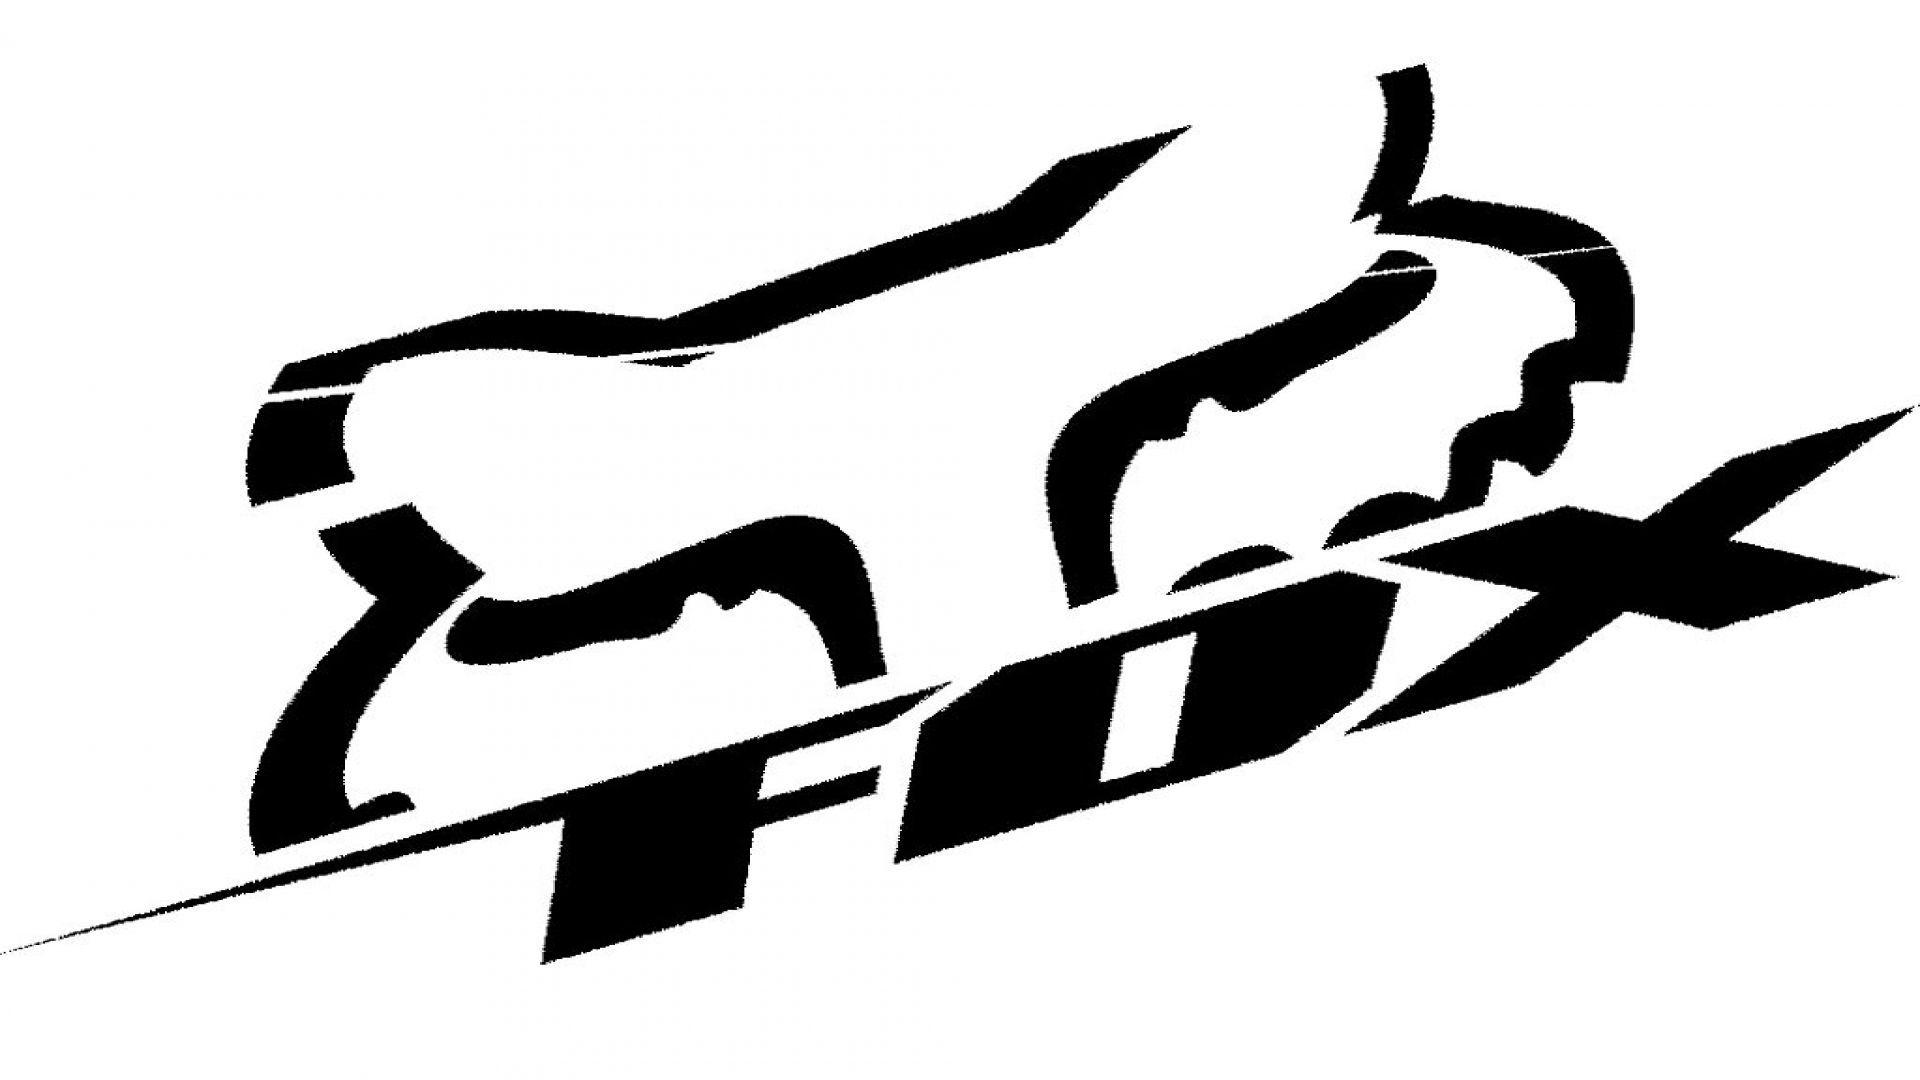 fox racing wallpaper 1600 1000 free fox racing wallpapers 51 rh pinterest ca fox logo wallpaper iphone fox logo wallpaper iphone